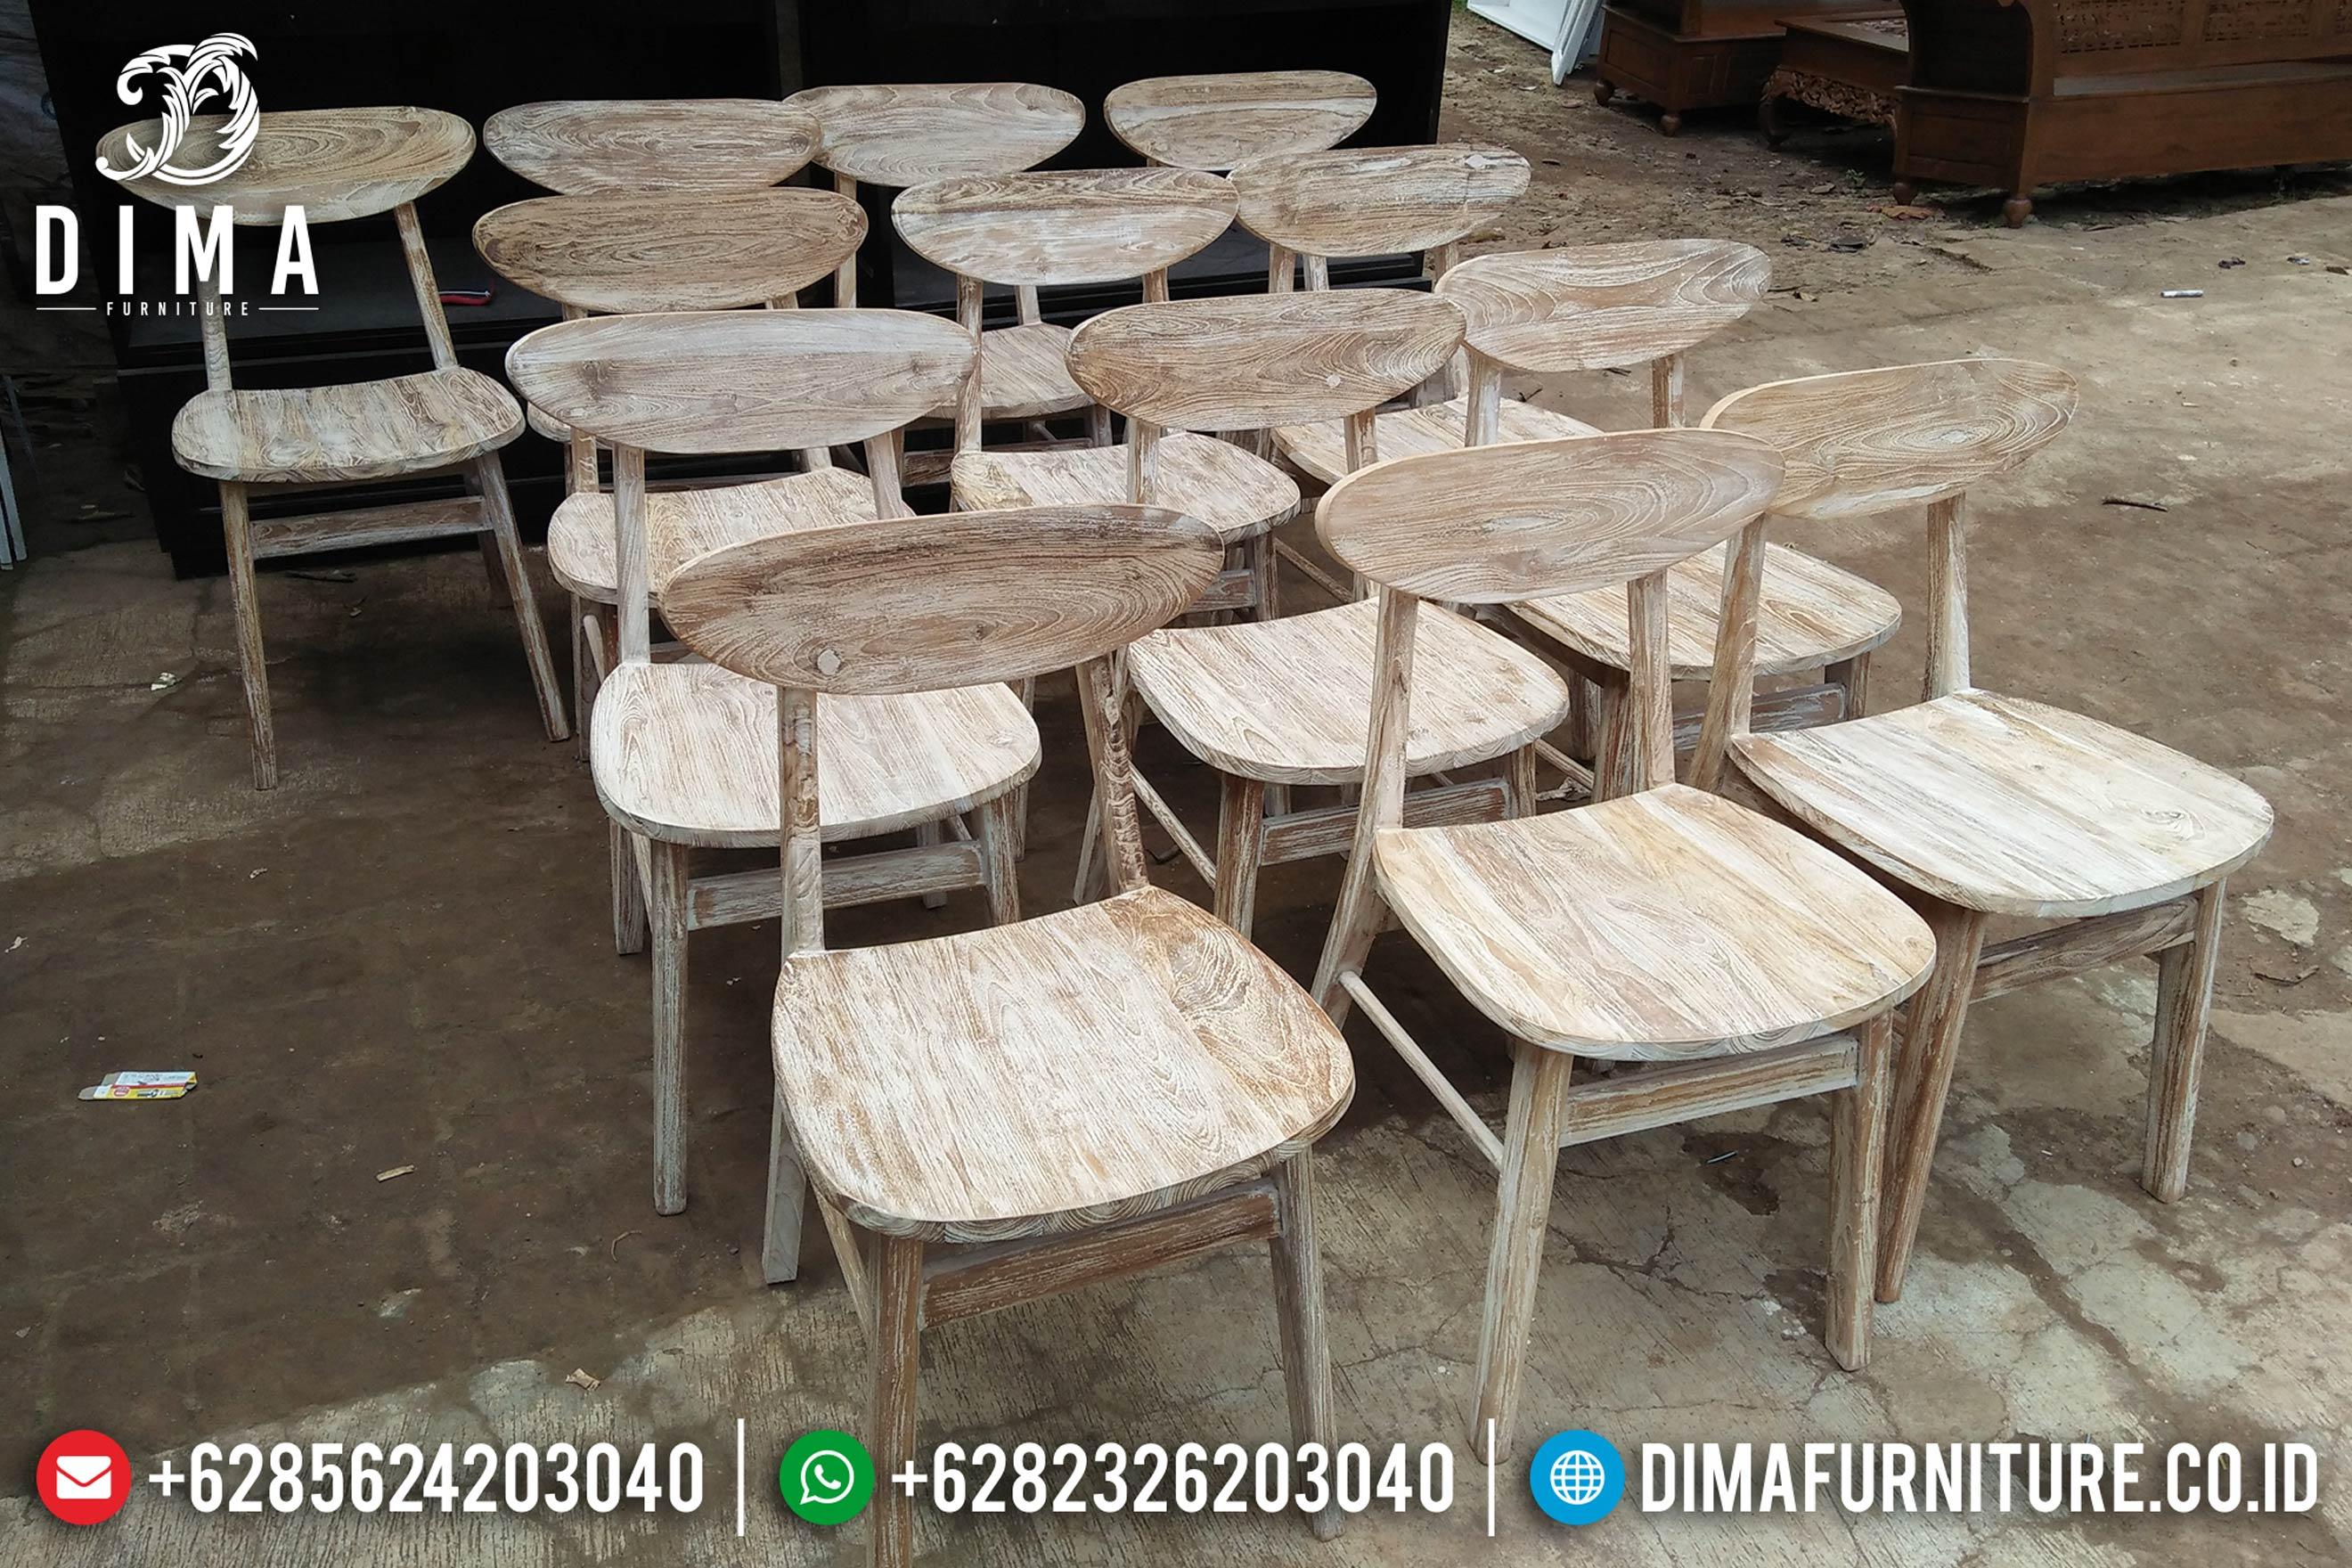 Kursi Cafe Jati Jepara, Kursi Cafe Minimalis, Kursi Restoran Hotel DF-0840